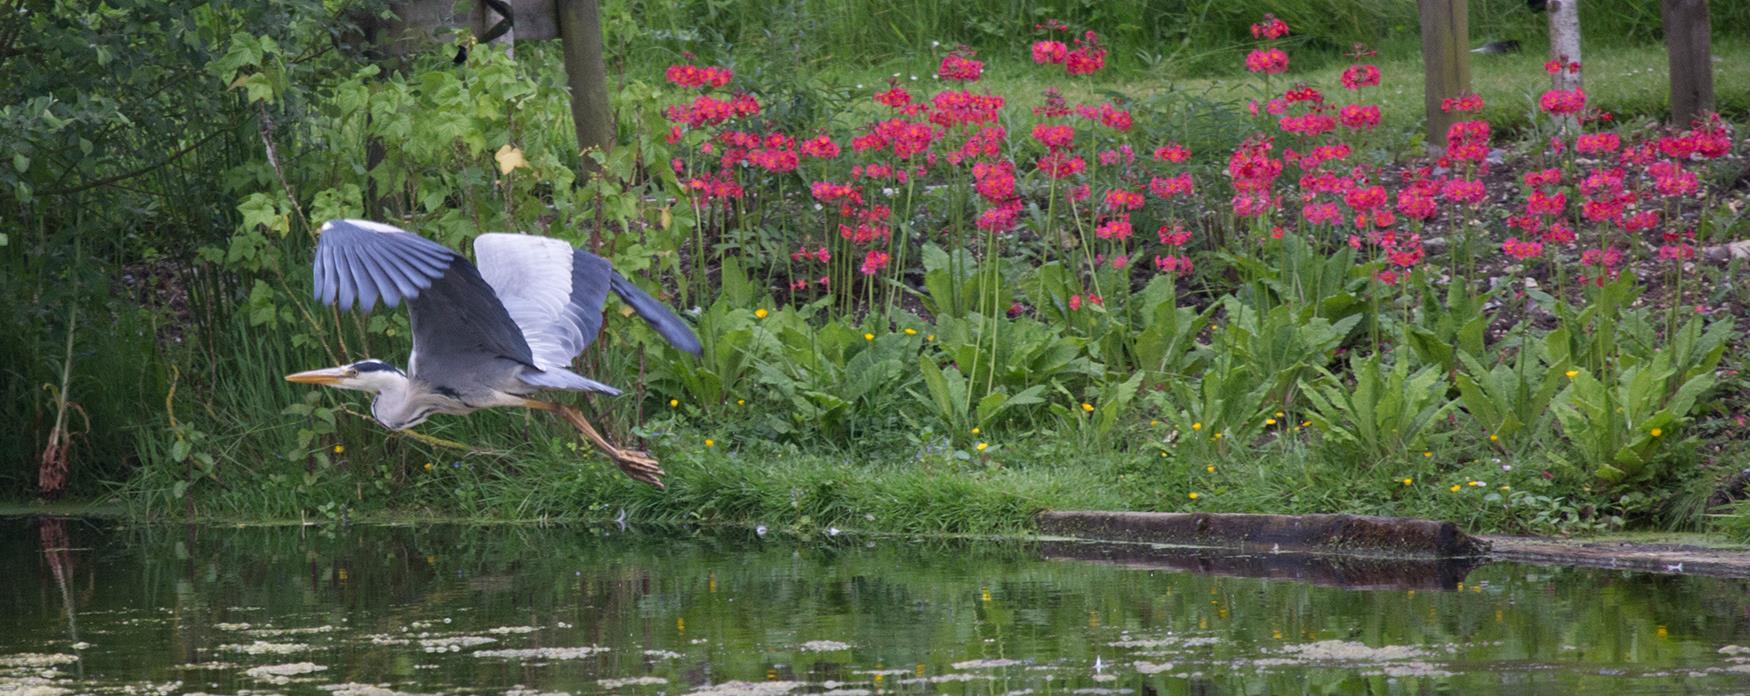 A heron taking flight at Bardfield Vineyard